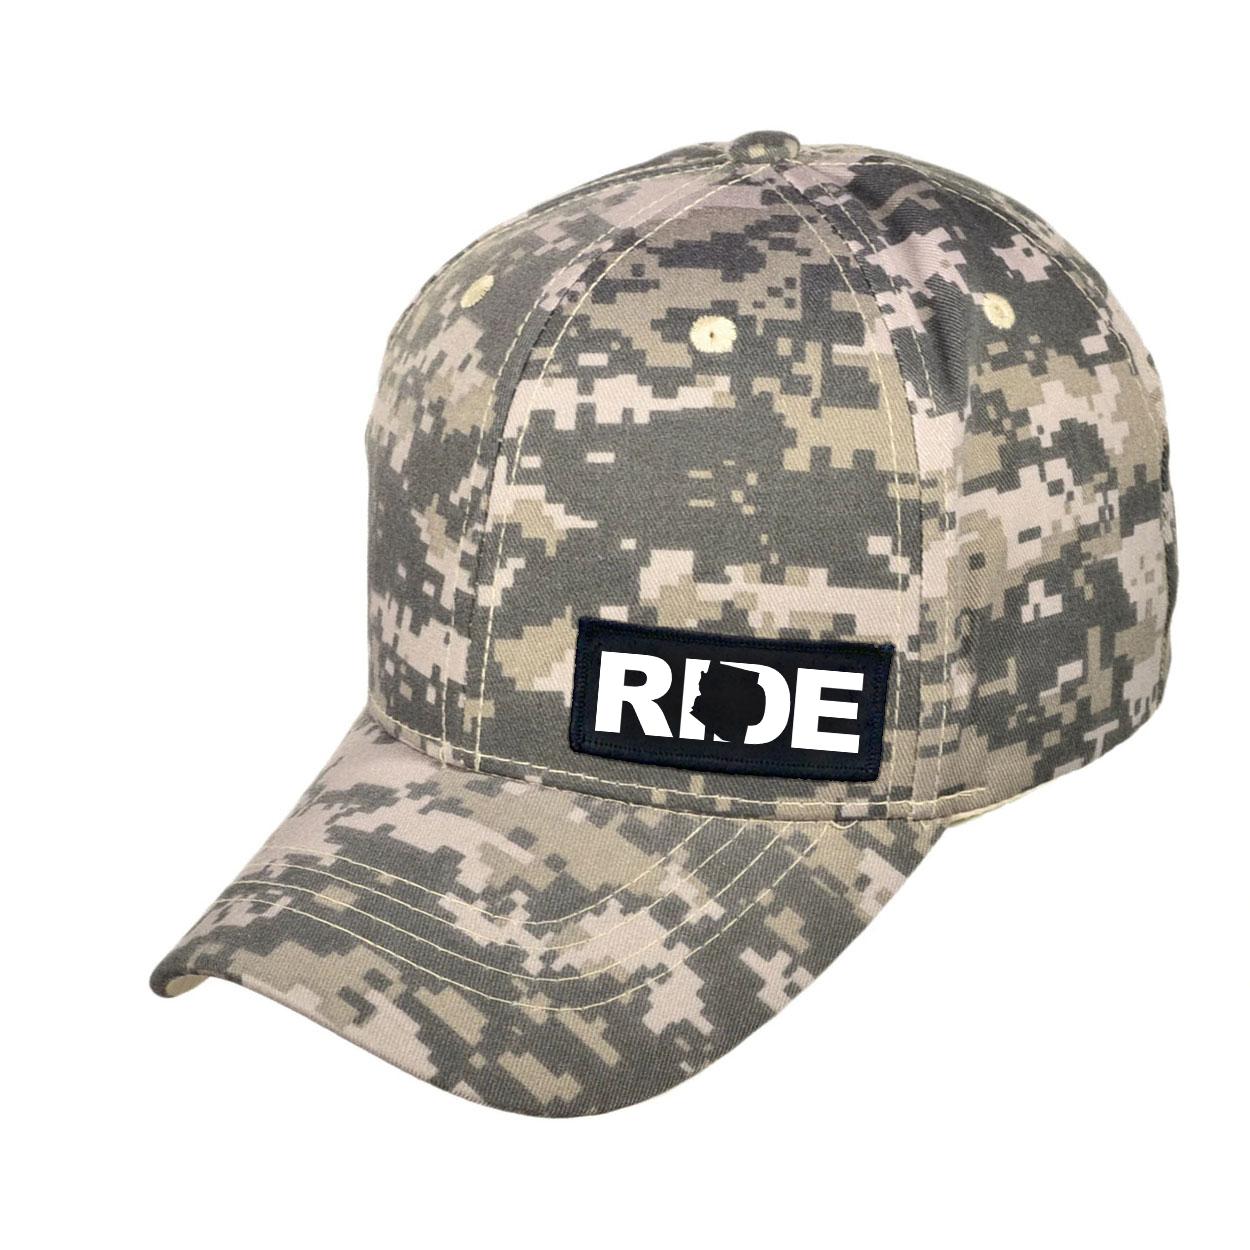 Ride Arizona Night Out Woven Patch Hat Digital Camo (White Logo)